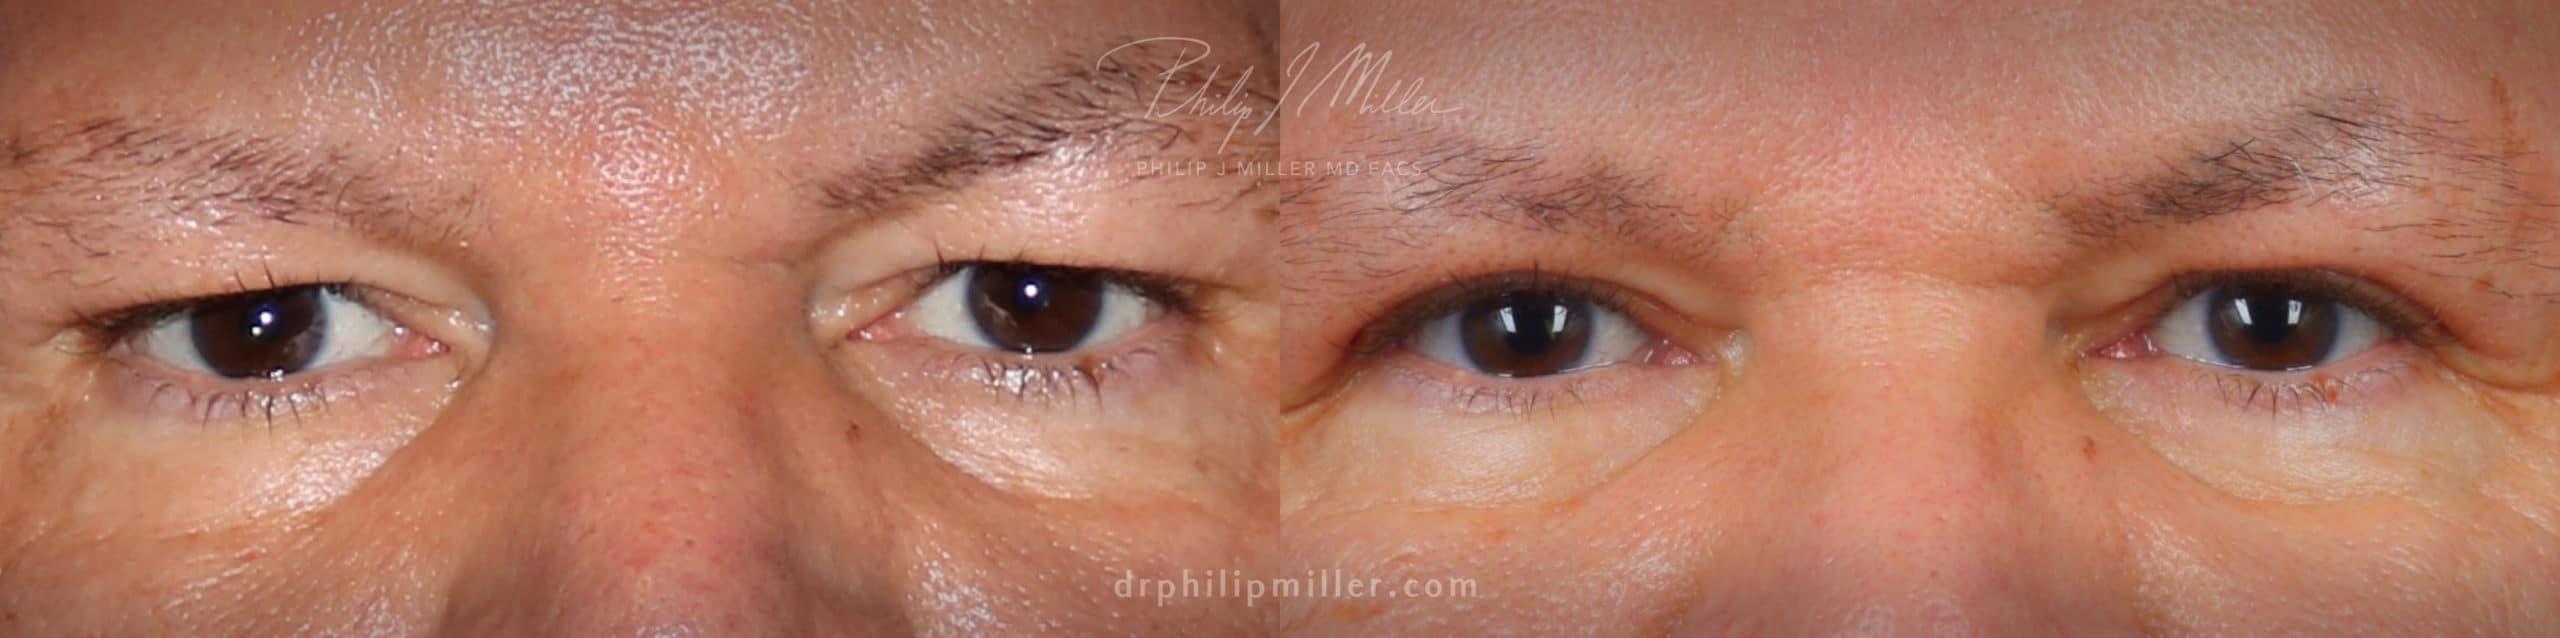 Upper blepharoplasty to treat eyelid hooding by Dr. Miller